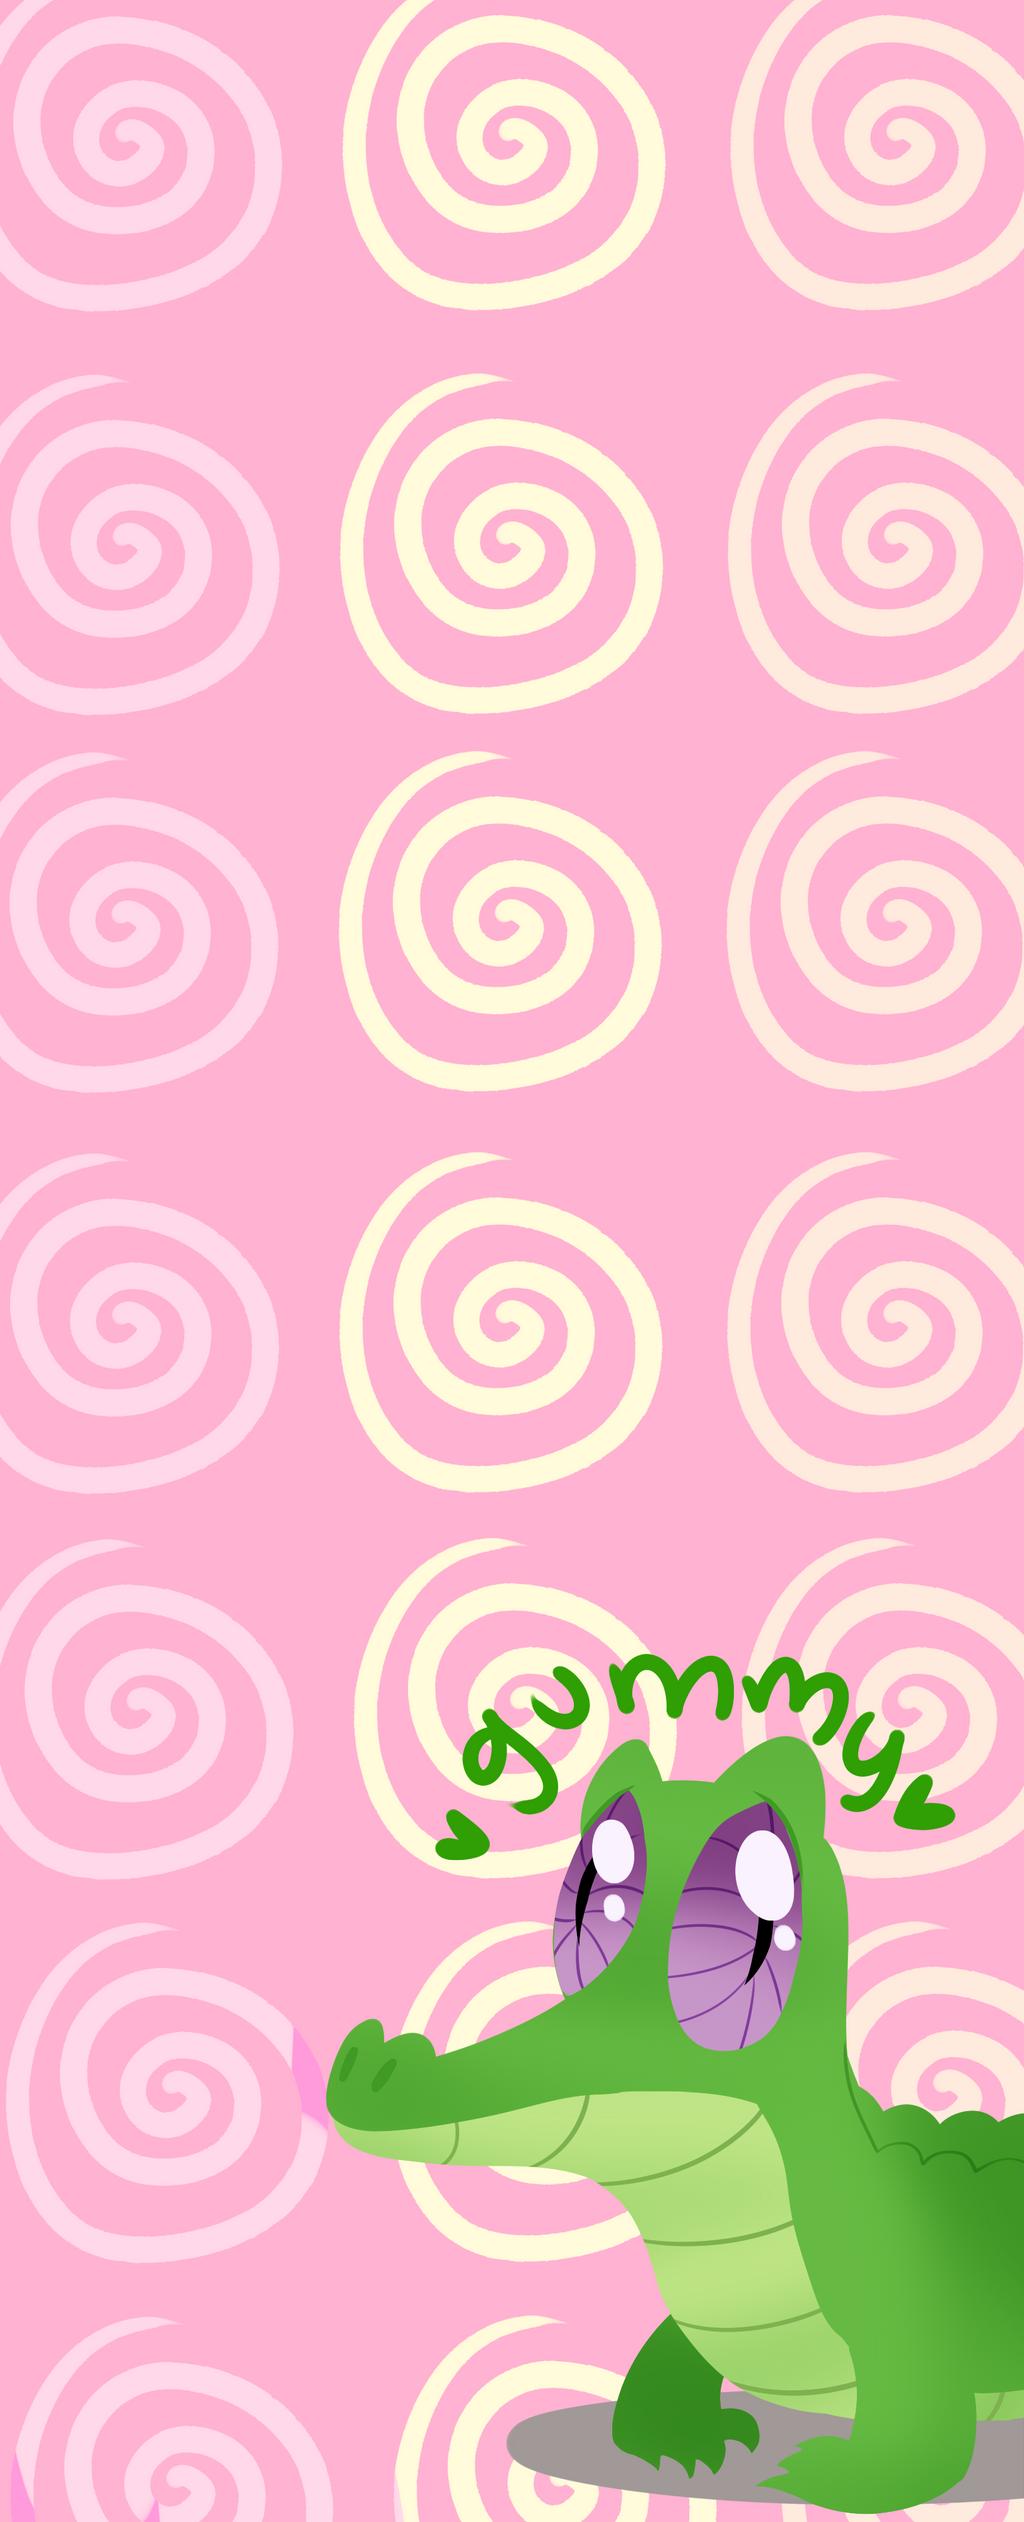 Gummy Book by CosmicPonye